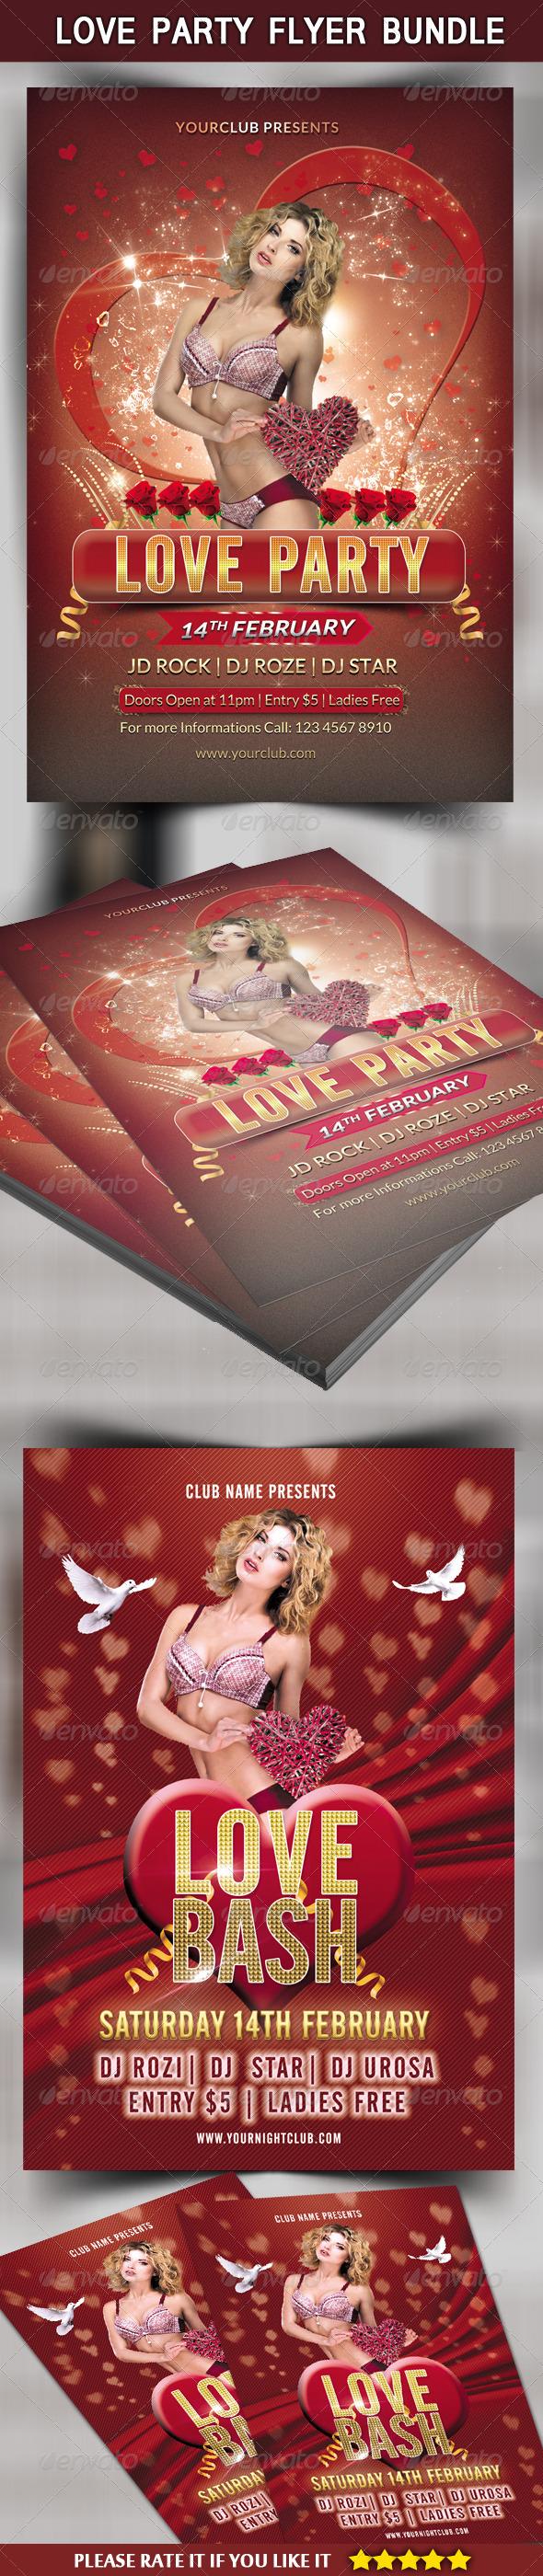 Love Party Flyer Bundle - Clubs & Parties Events